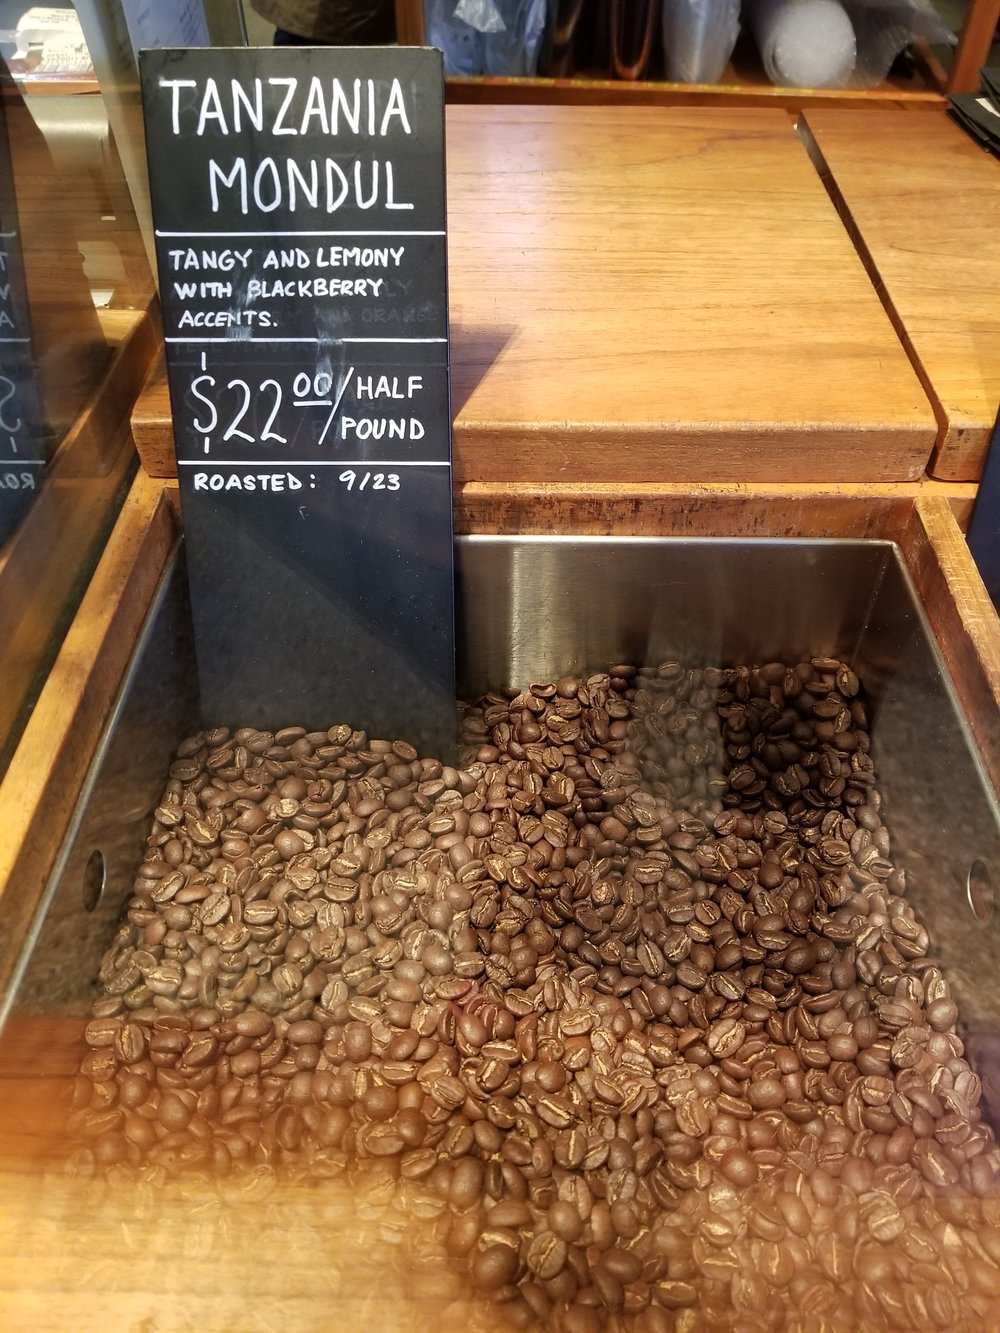 09.29.2018 Tanzania Mondul on Scoop Bar at the Seattle Roastery.jpg